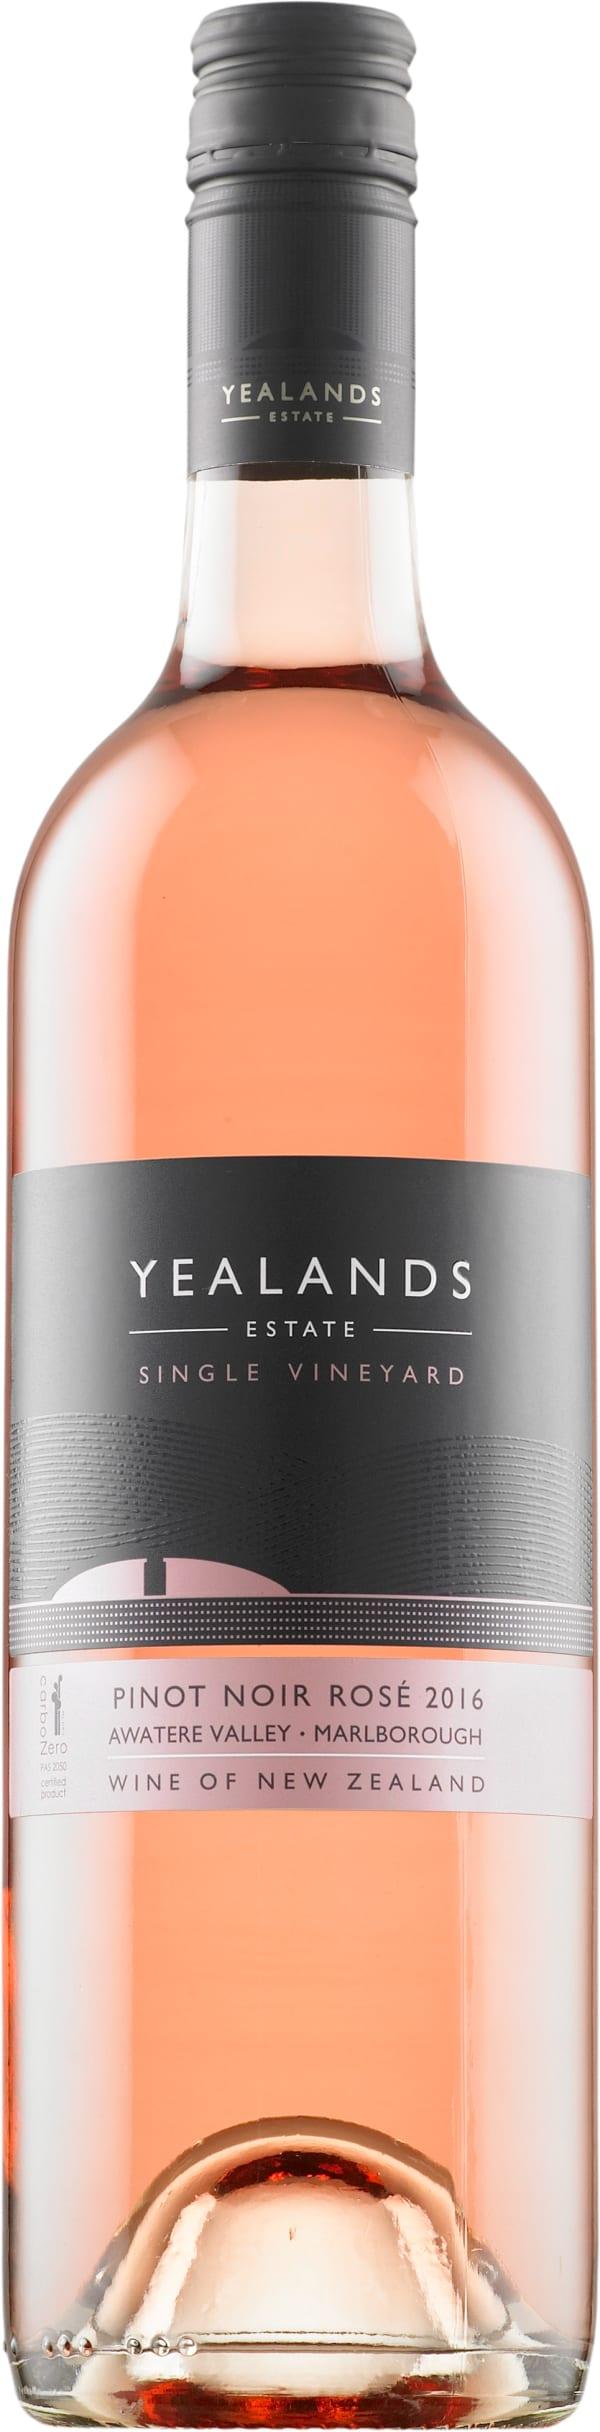 Yealands Estate Single Vineyard Pinot Noir Rosé 2017